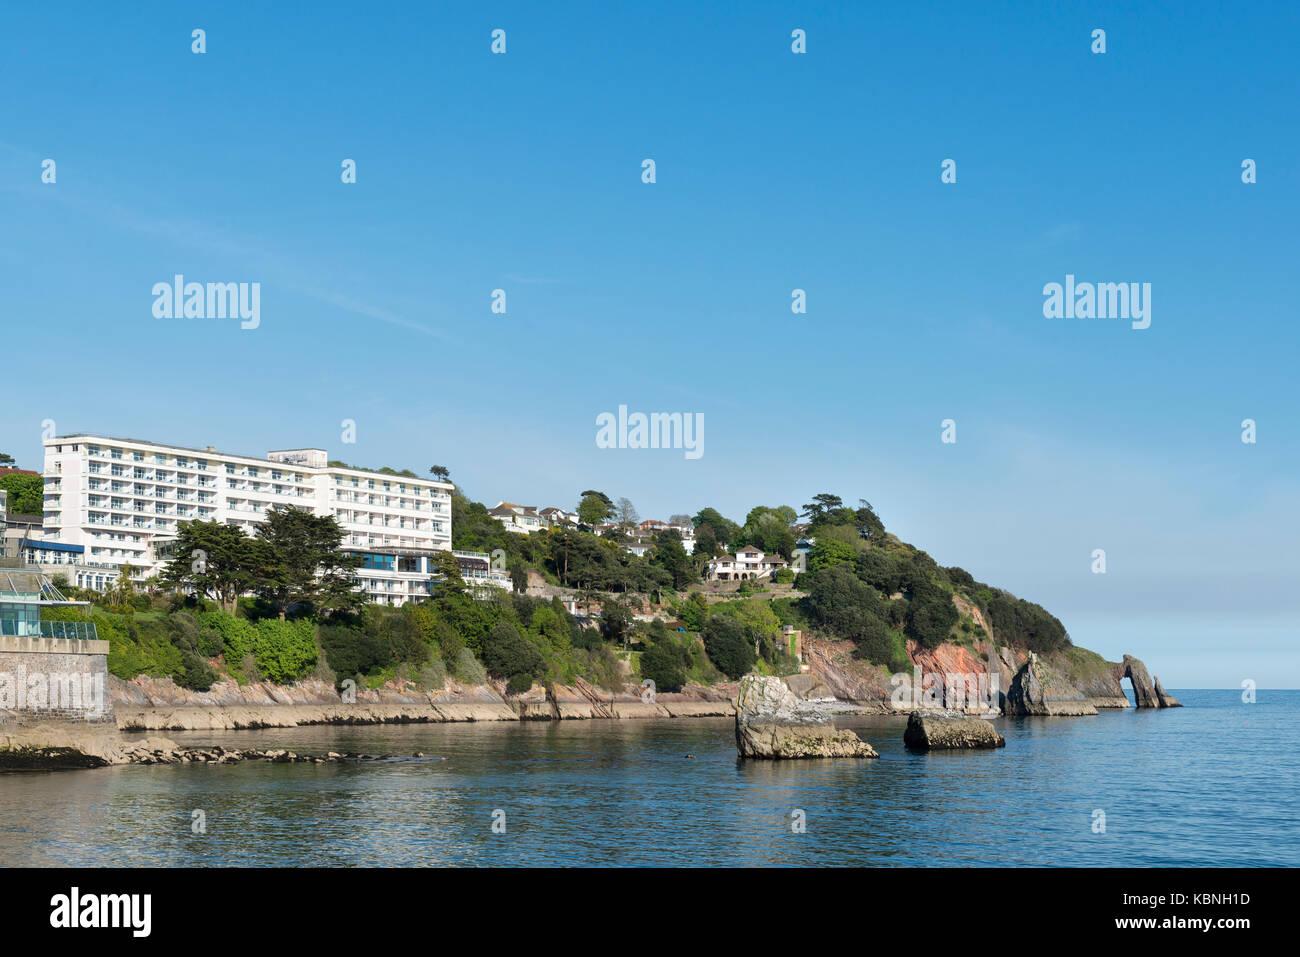 Bay Hotel Torquay